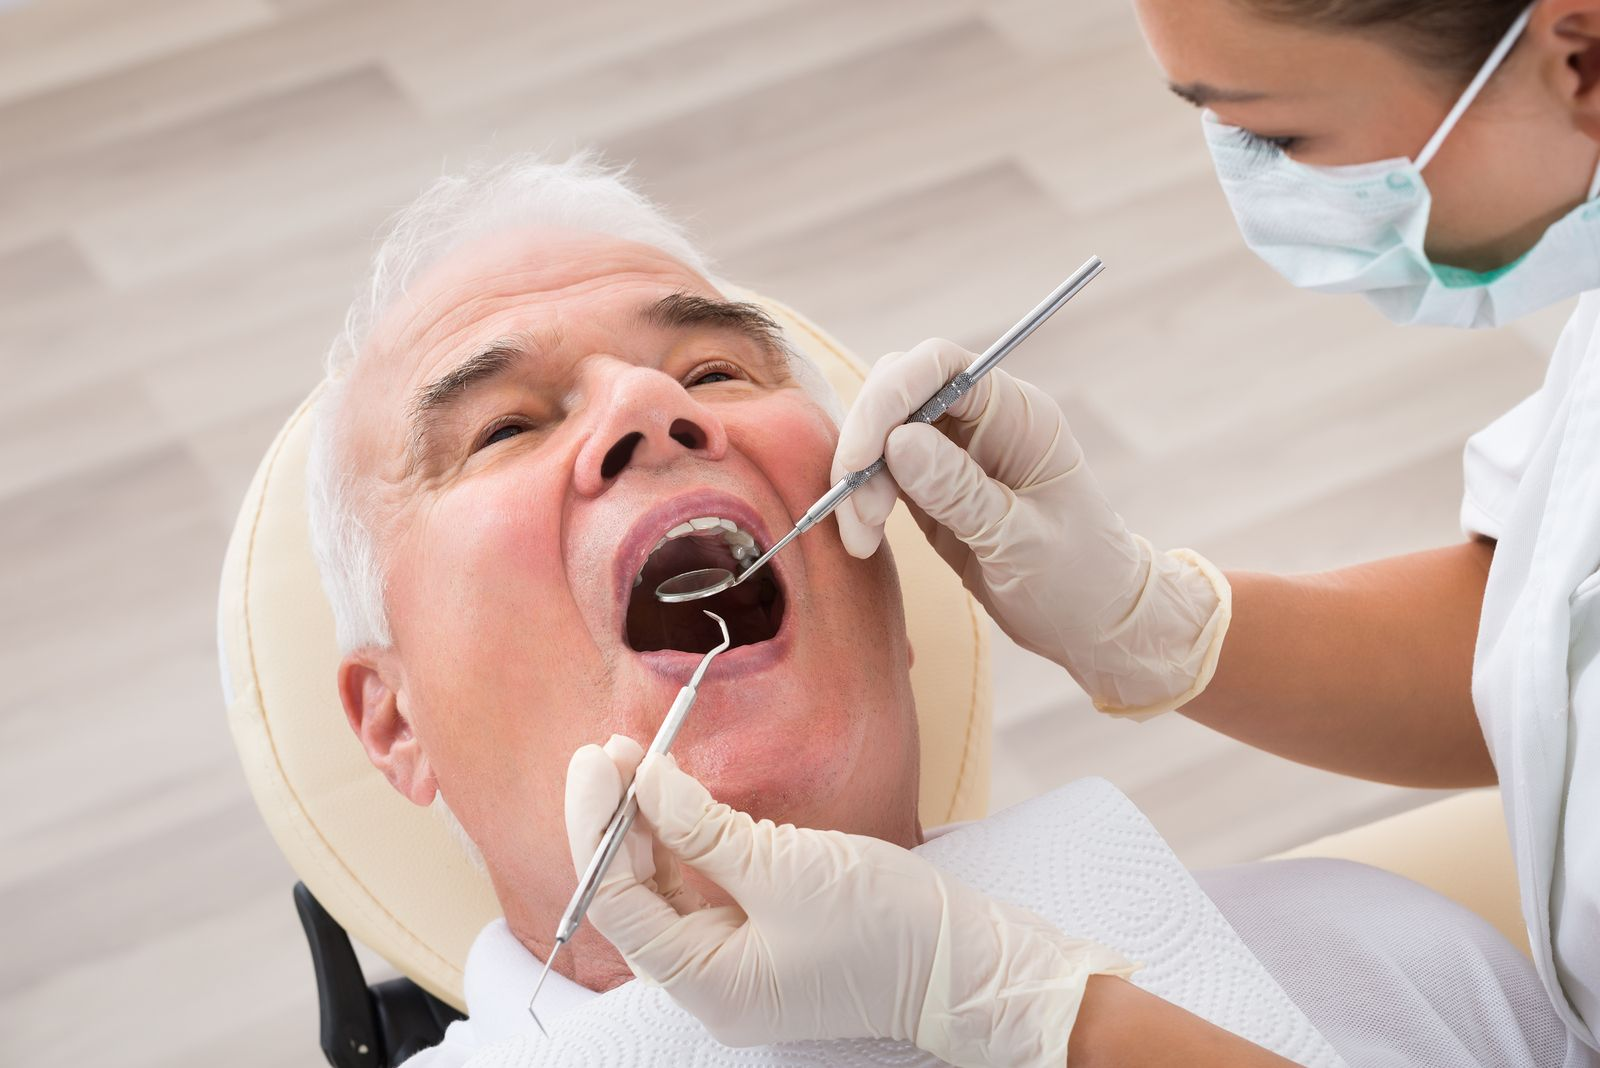 Dental Implants Near Me Invisalign dentist, Emergency